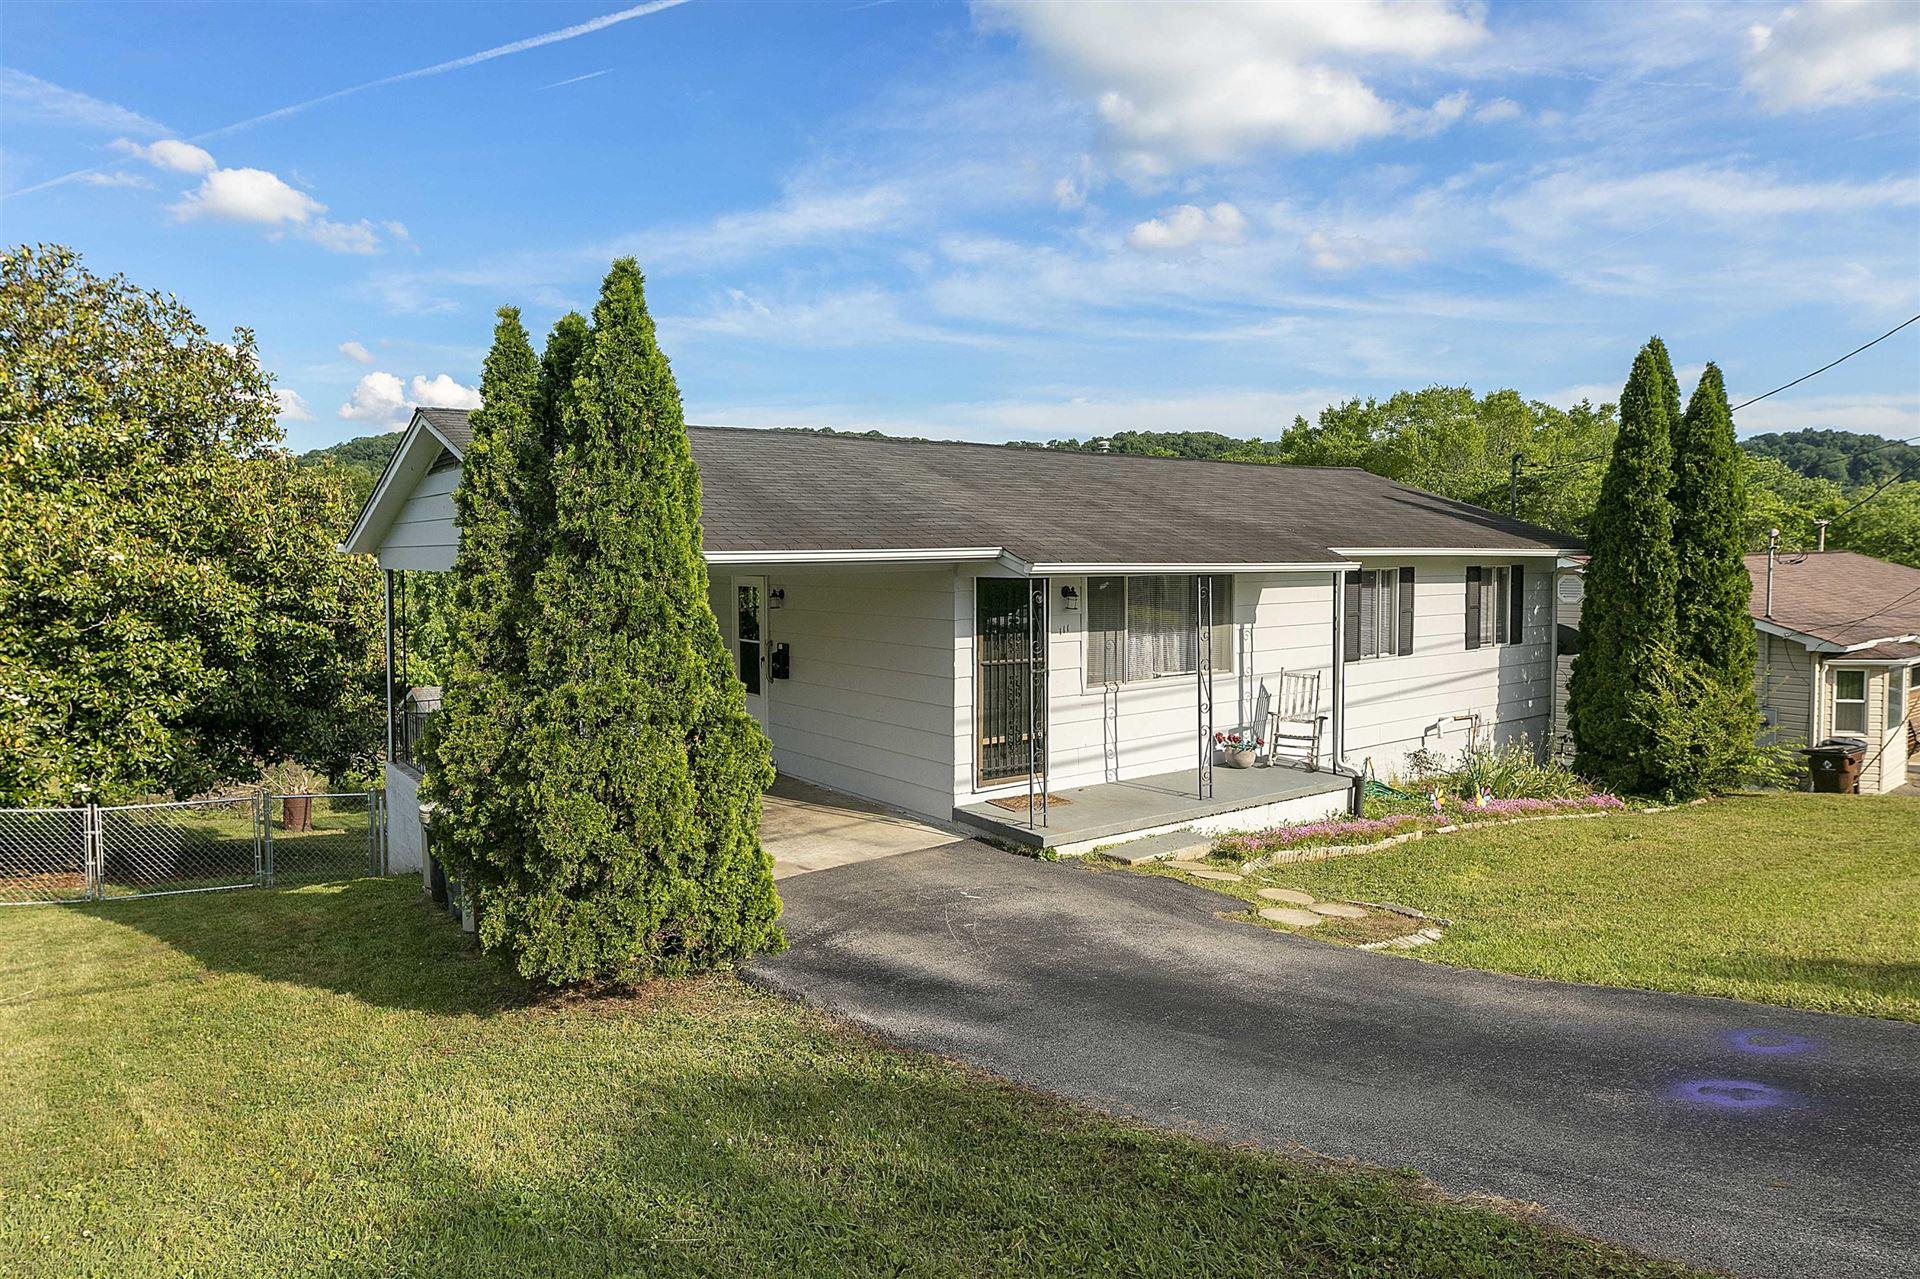 Photo of 111 Lancaster Rd, Oak Ridge, TN 37830 (MLS # 1154383)